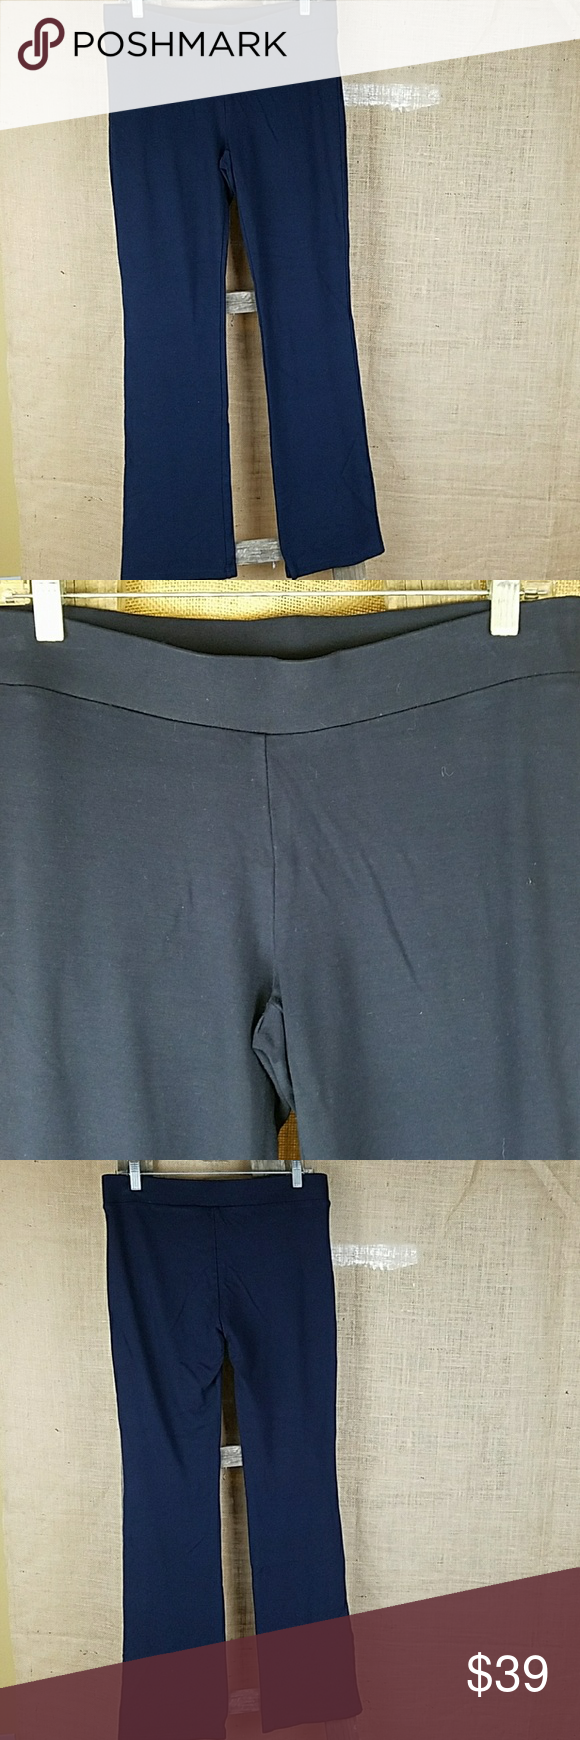 badd757b8a404a CAbi women's M black Nouveau leggings thick slim CAbi women's M black  Nouveau leggings thick slim leg pants. Waist side to side: 16.5